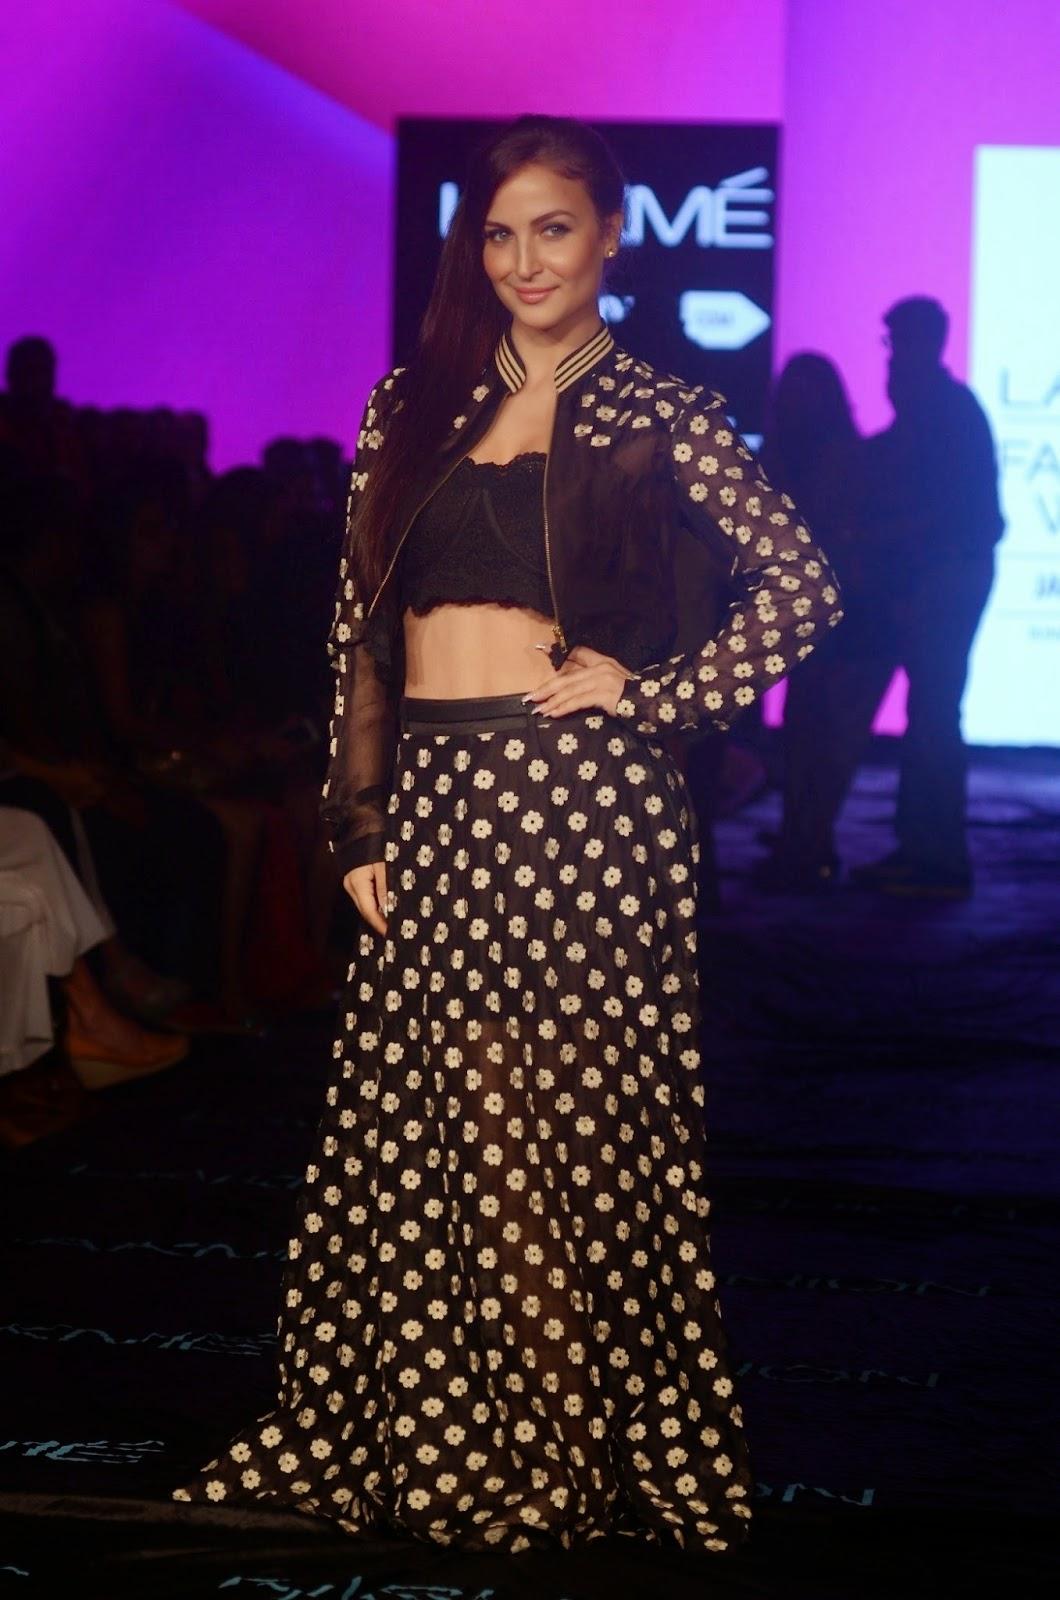 Elli Avram in Spicy Printed Black Dress at Lakme Fashion Week 2015